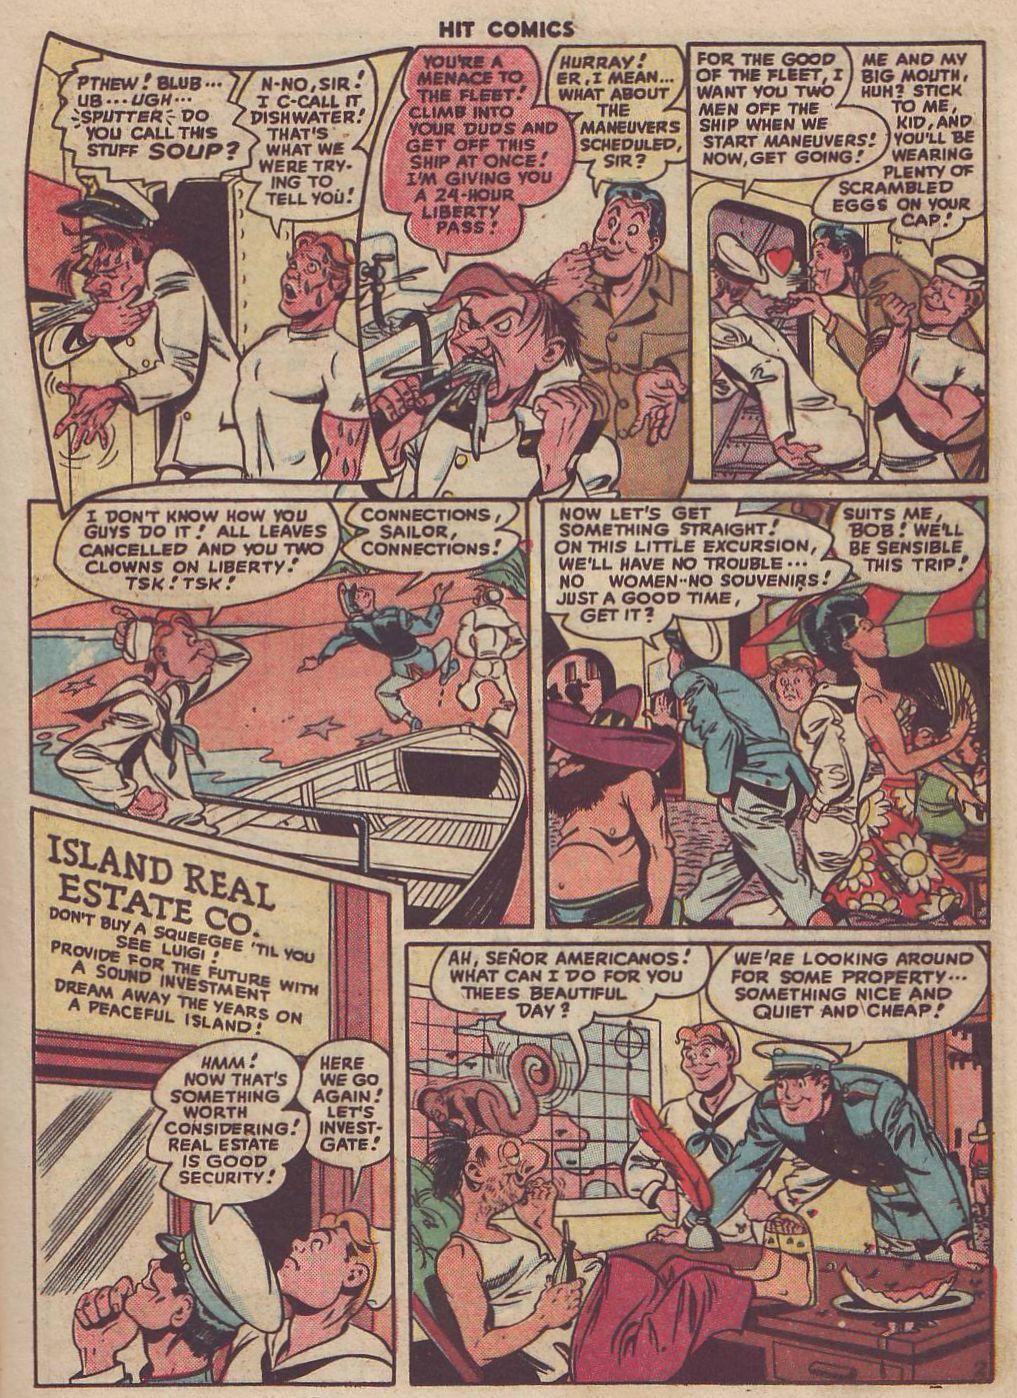 Read online Hit Comics comic -  Issue #51 - 17